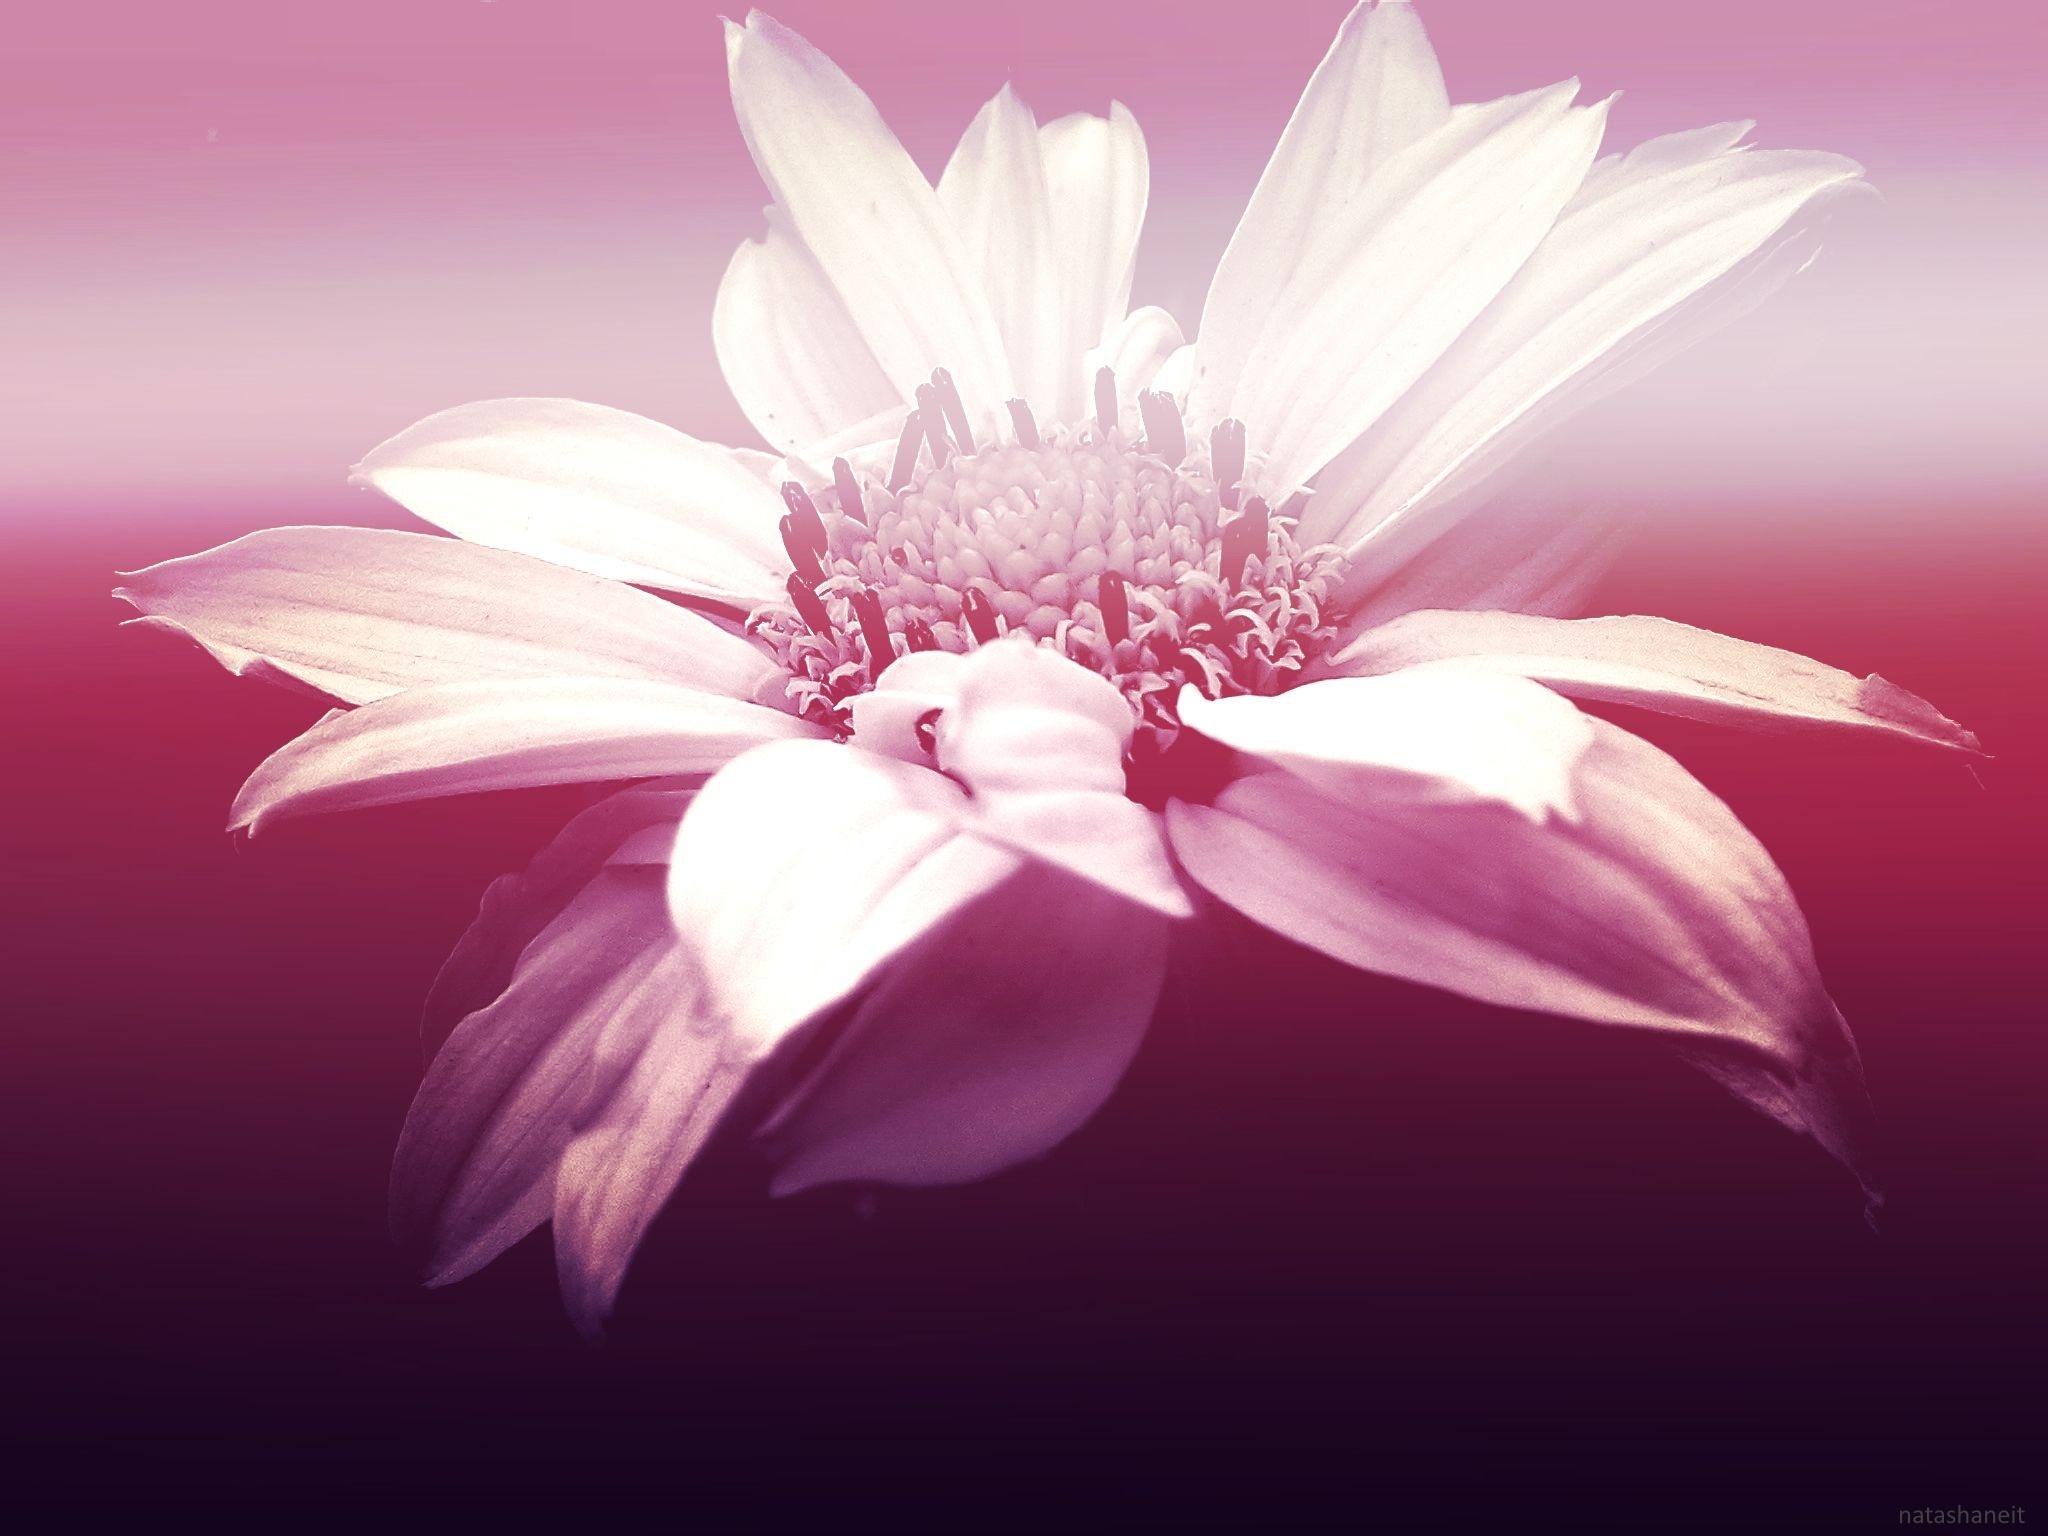 Tenderness by natashaneit